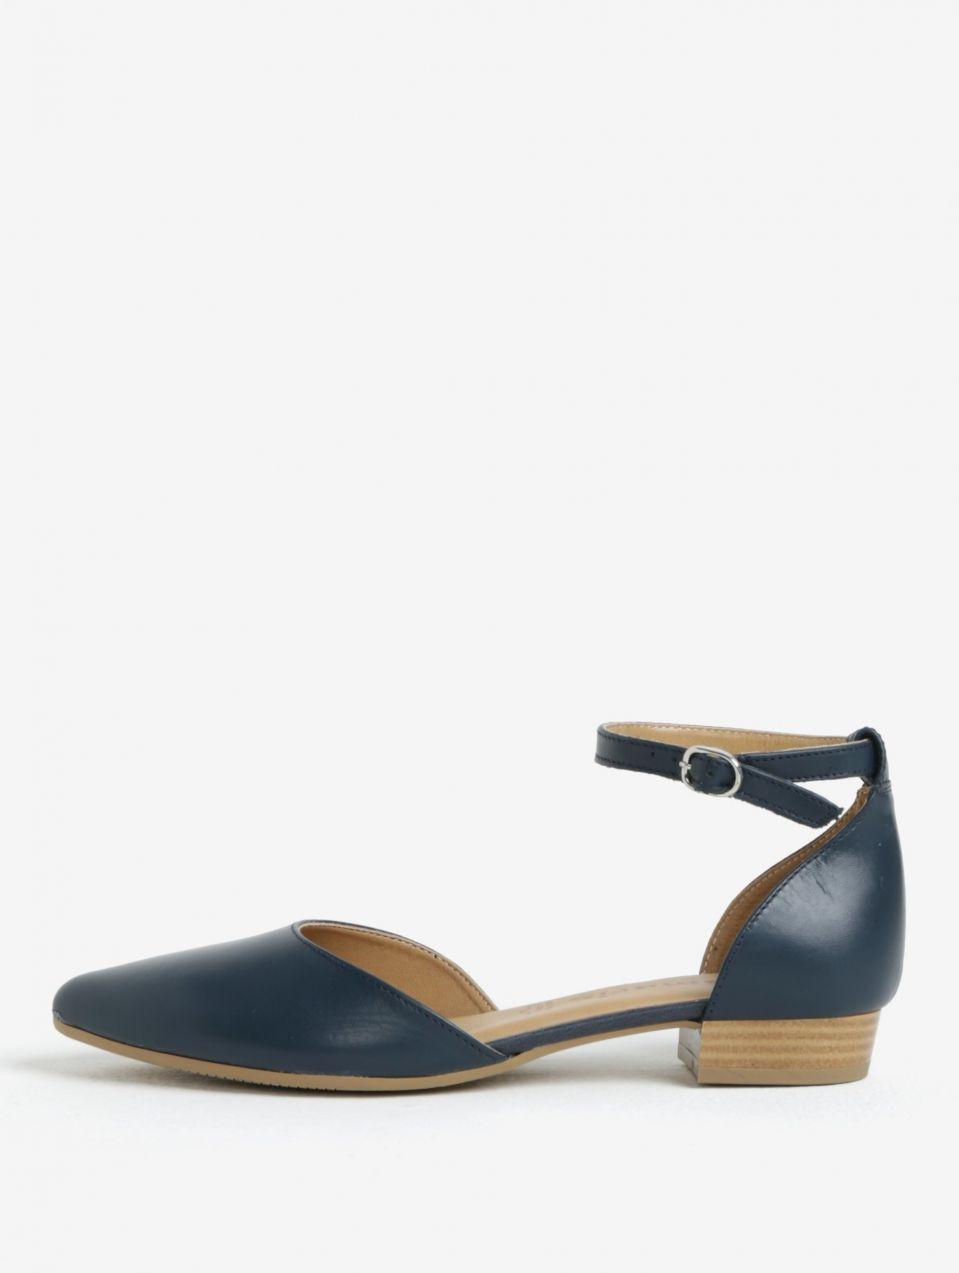 35ac250d25b7 Tmavomodré kožené sandále Tamaris značky Tamaris - Lovely.sk